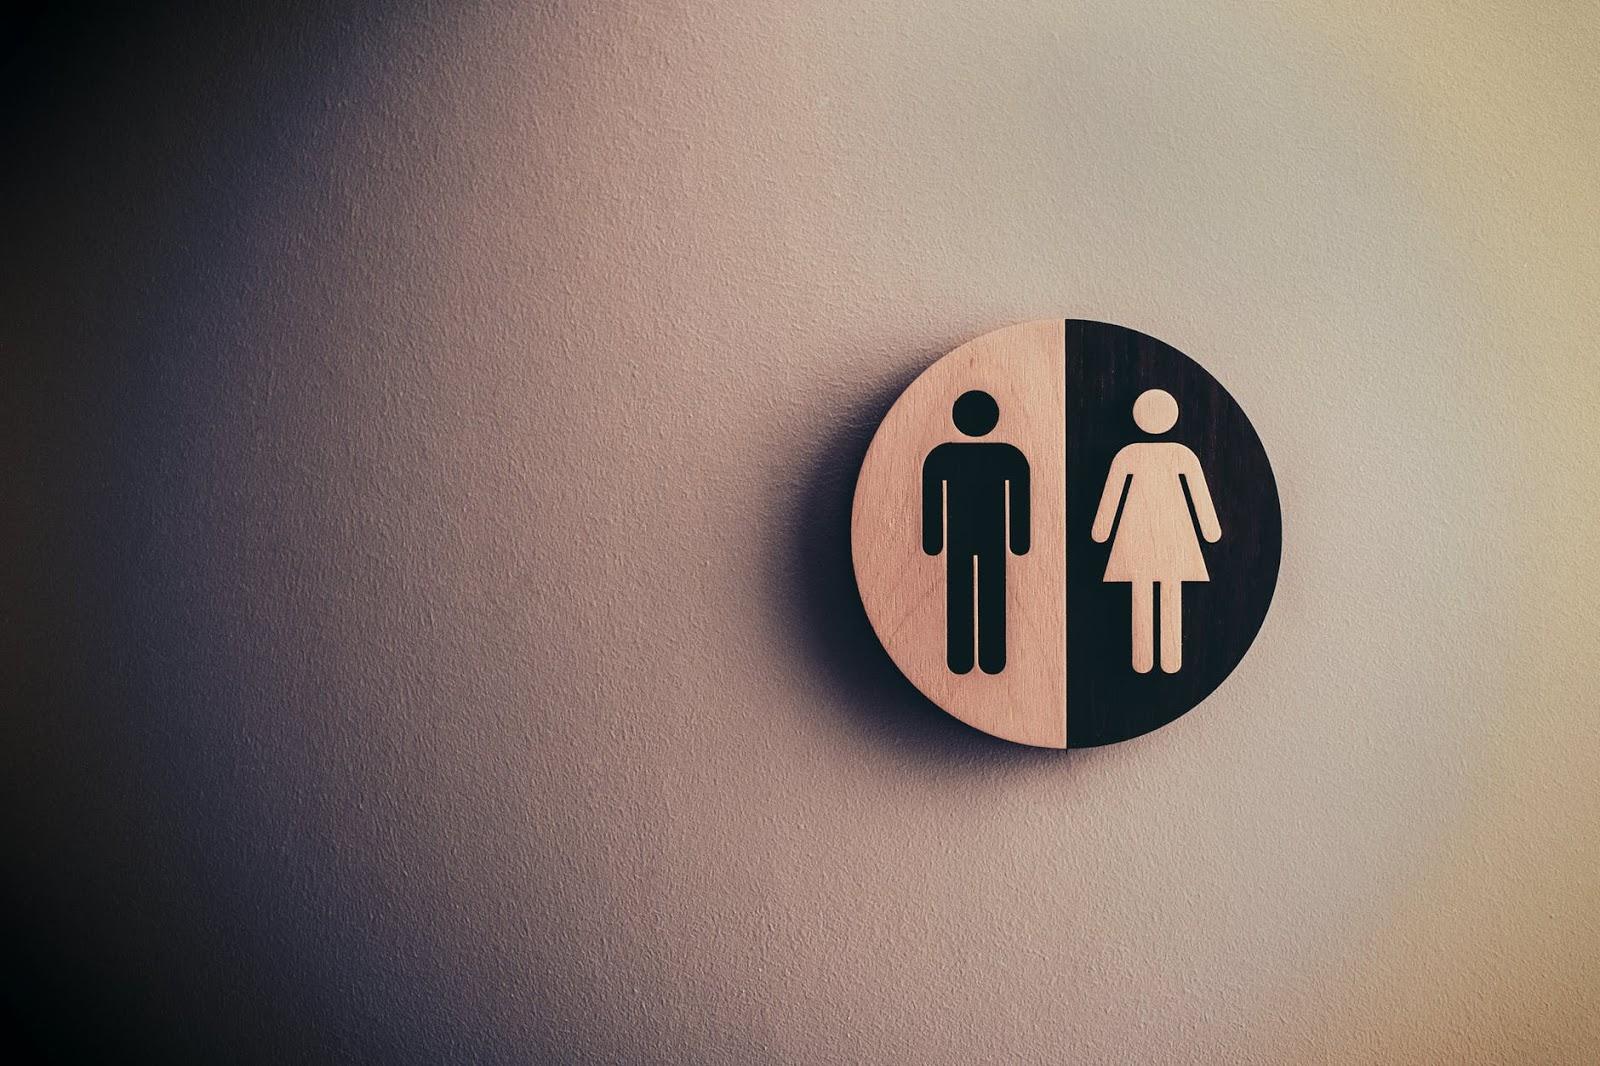 Quick Fix Urine and Its Purposes